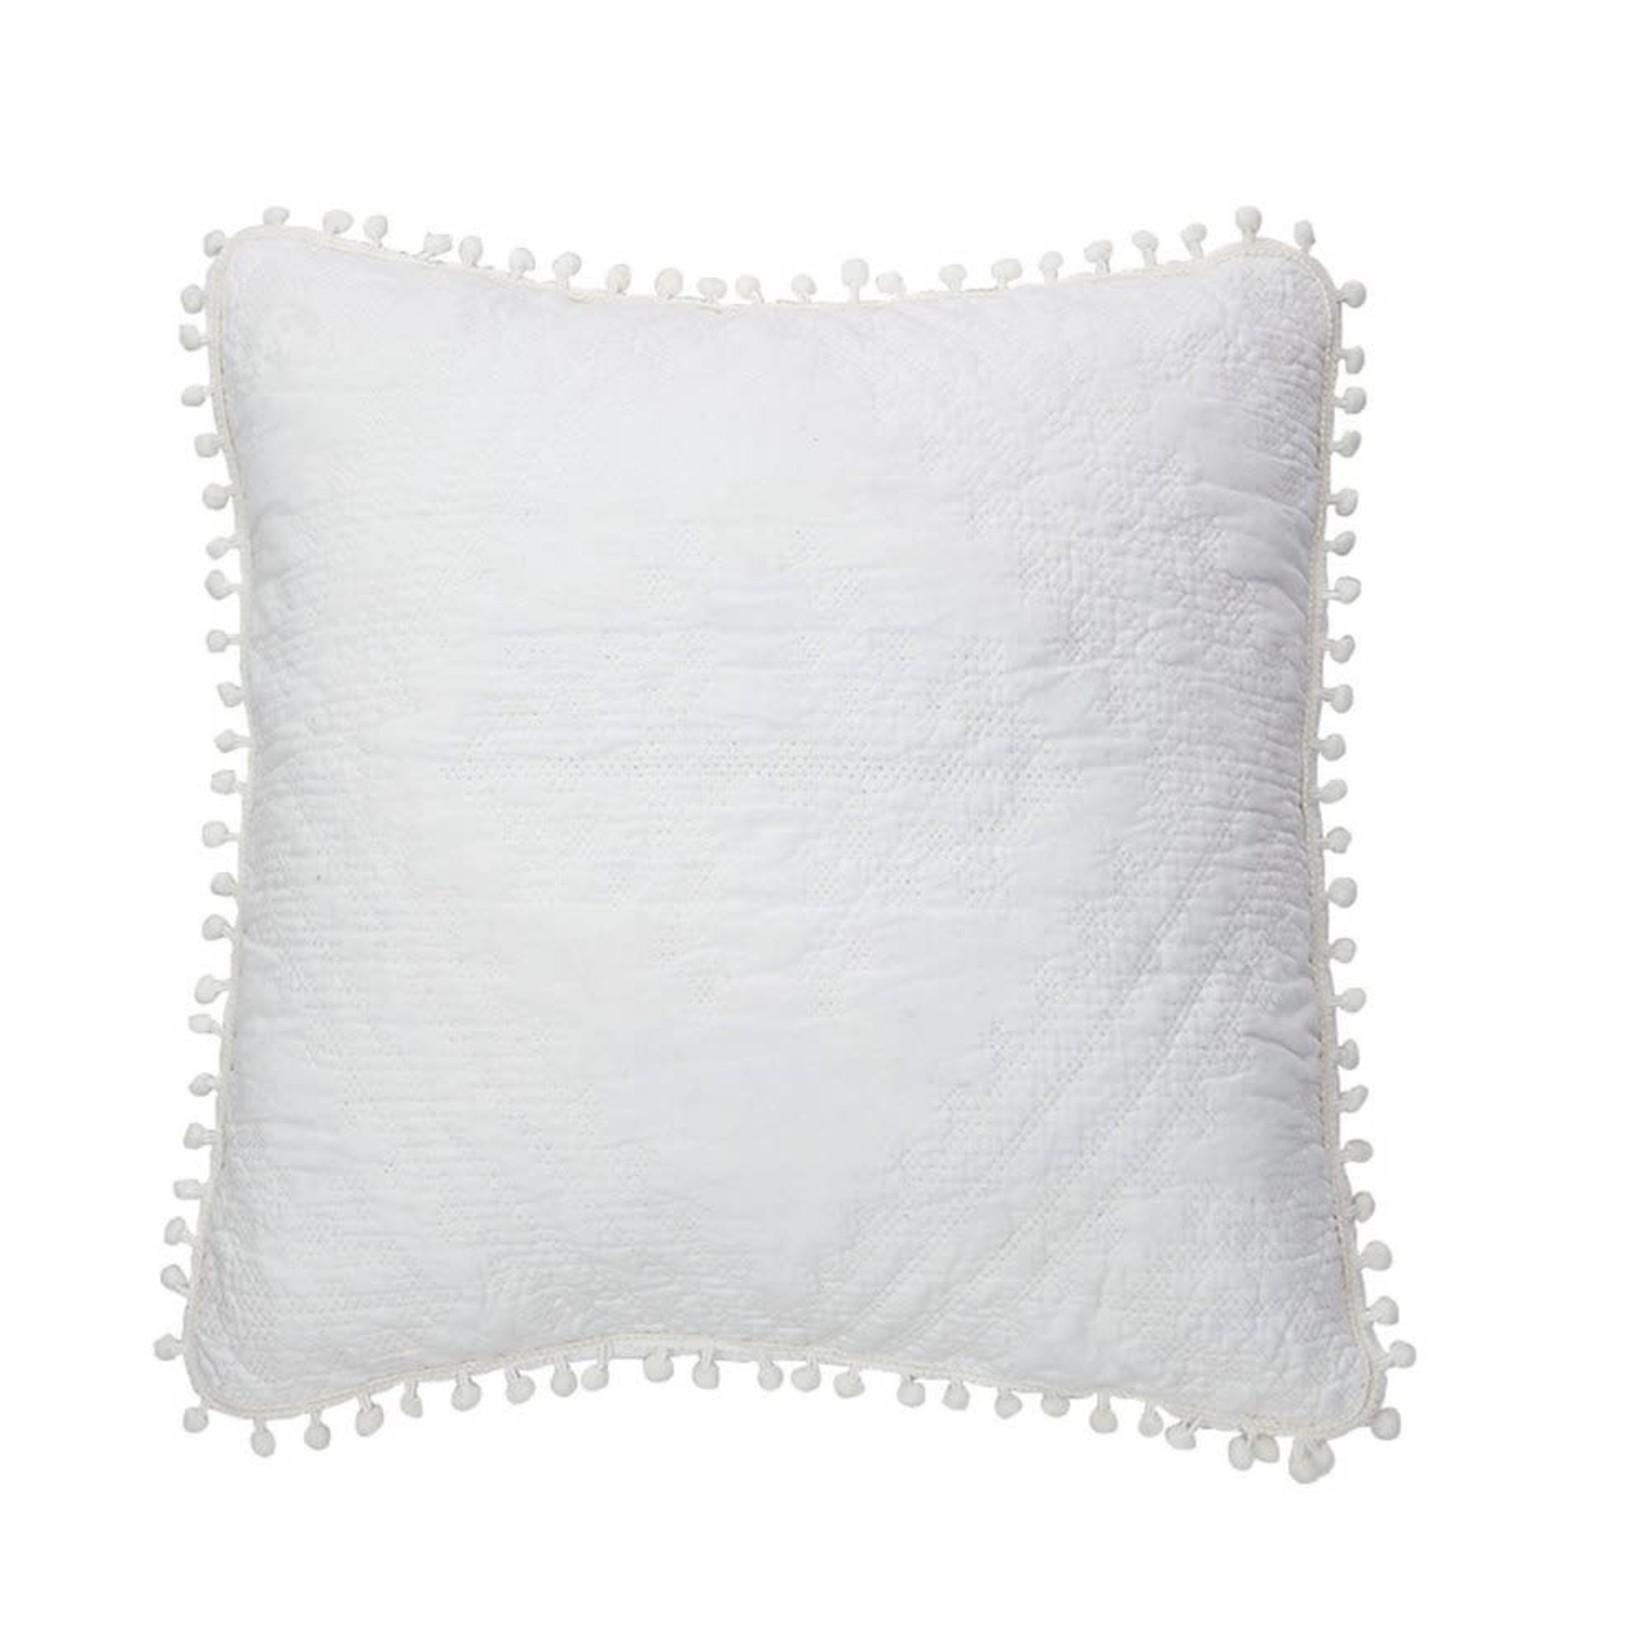 Ethos White Cushion Cover